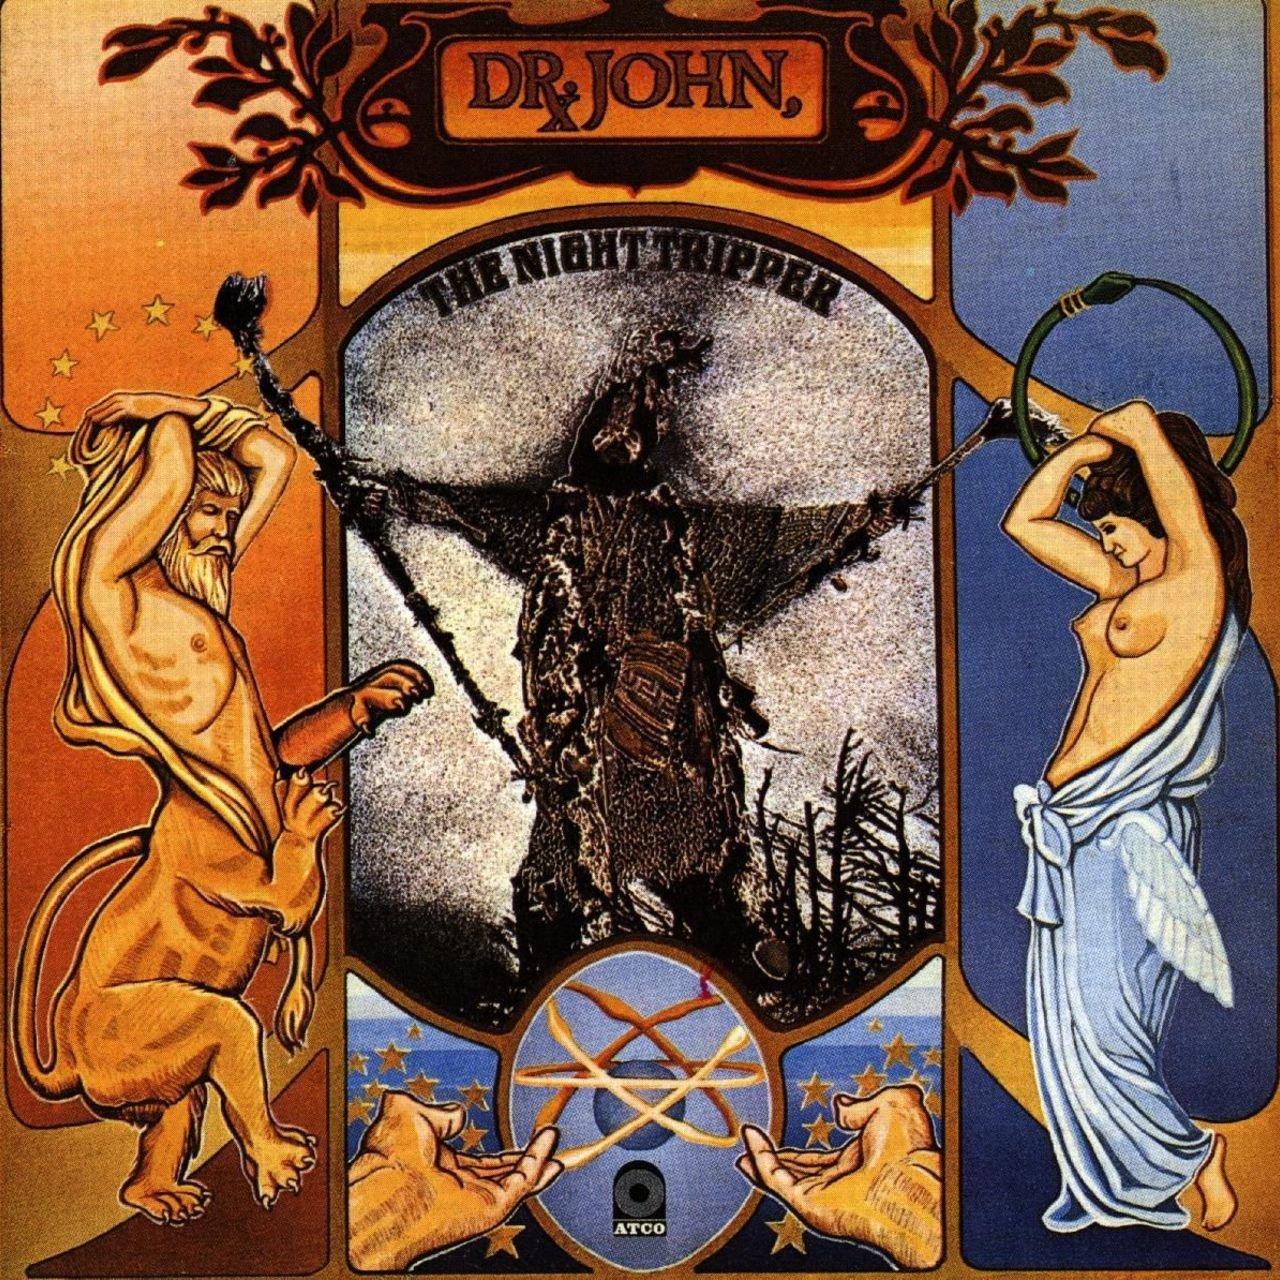 Dr. John - The Sun, Moon & Herbs [LP]